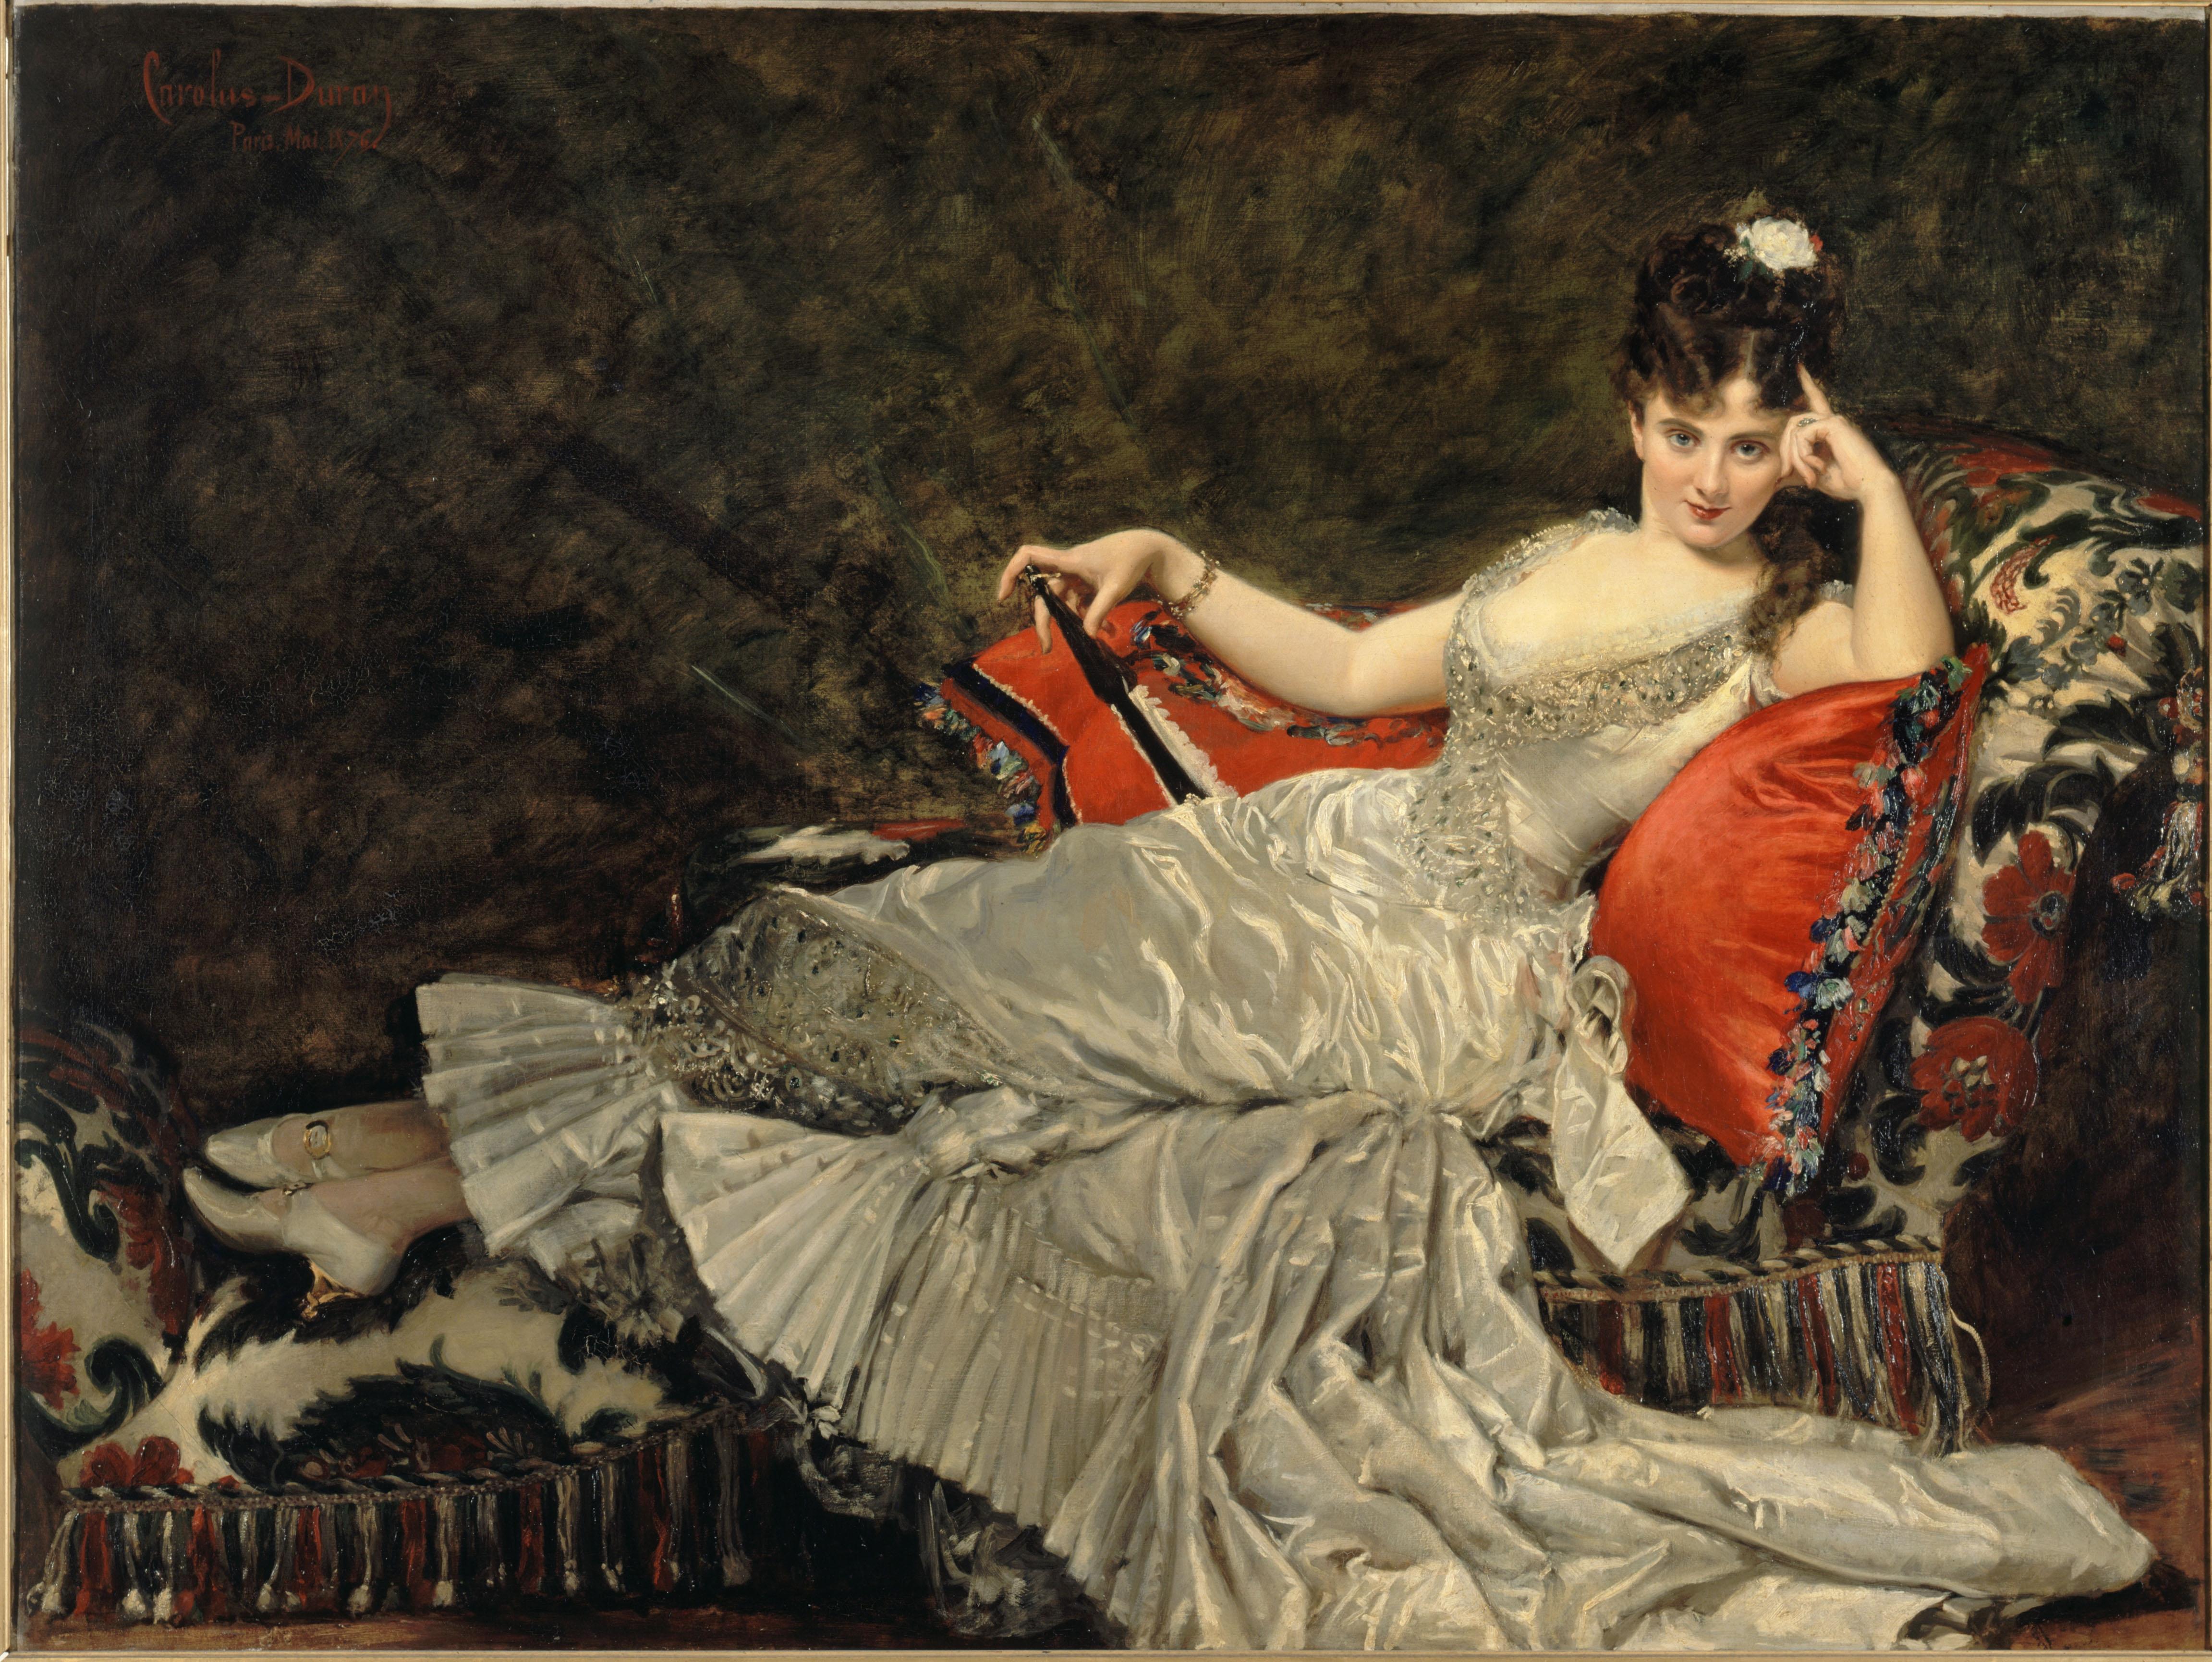 Mademoiselle de Lancey de Carolus-Duran